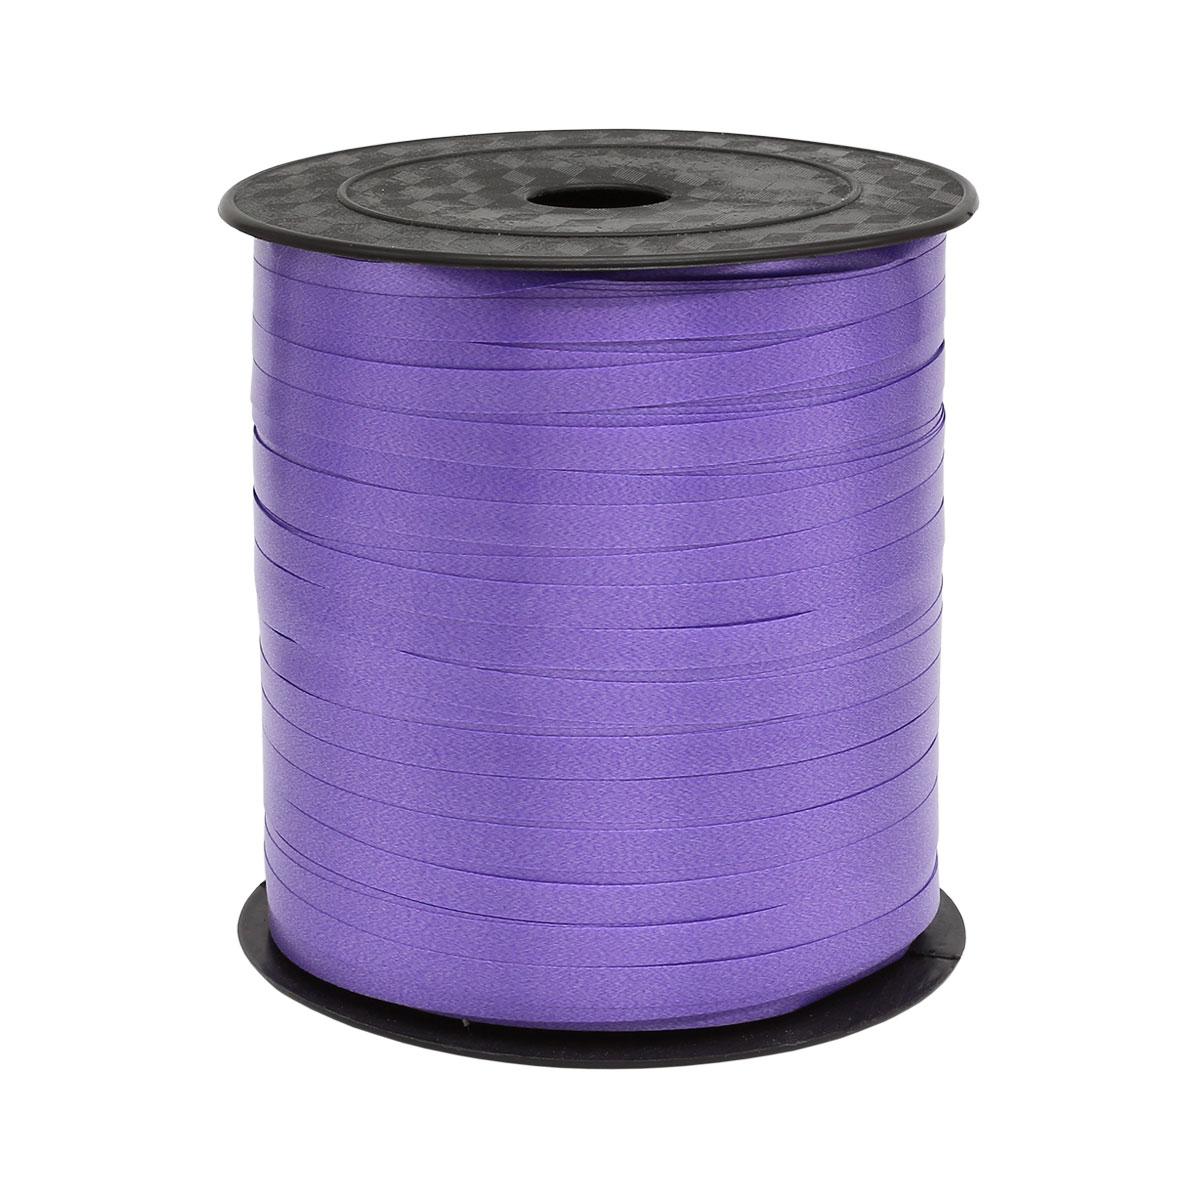 71144 Лента простая 0,5/250 фиолетовая